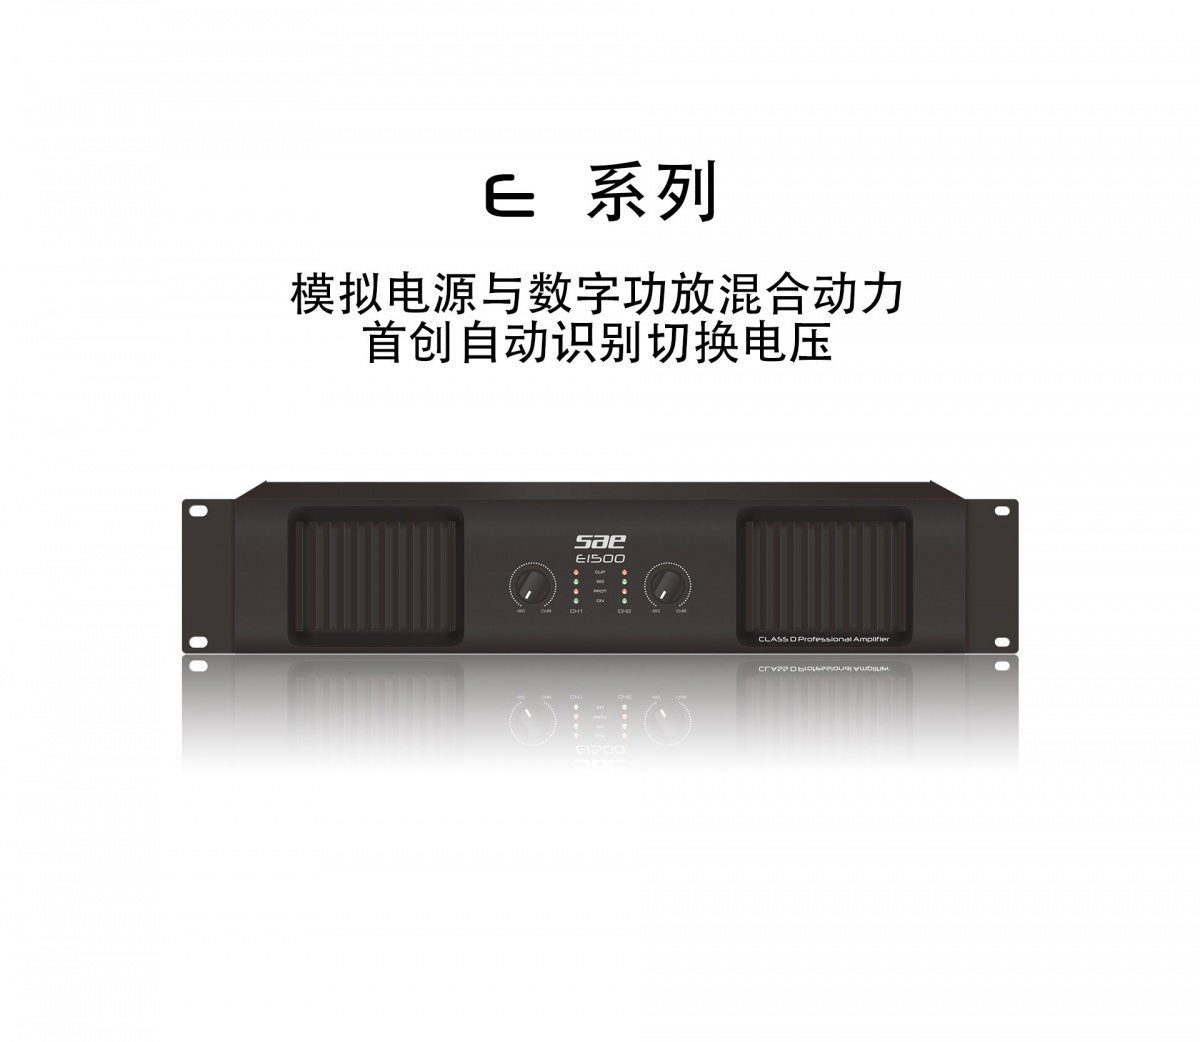 E-series-CN.jpg